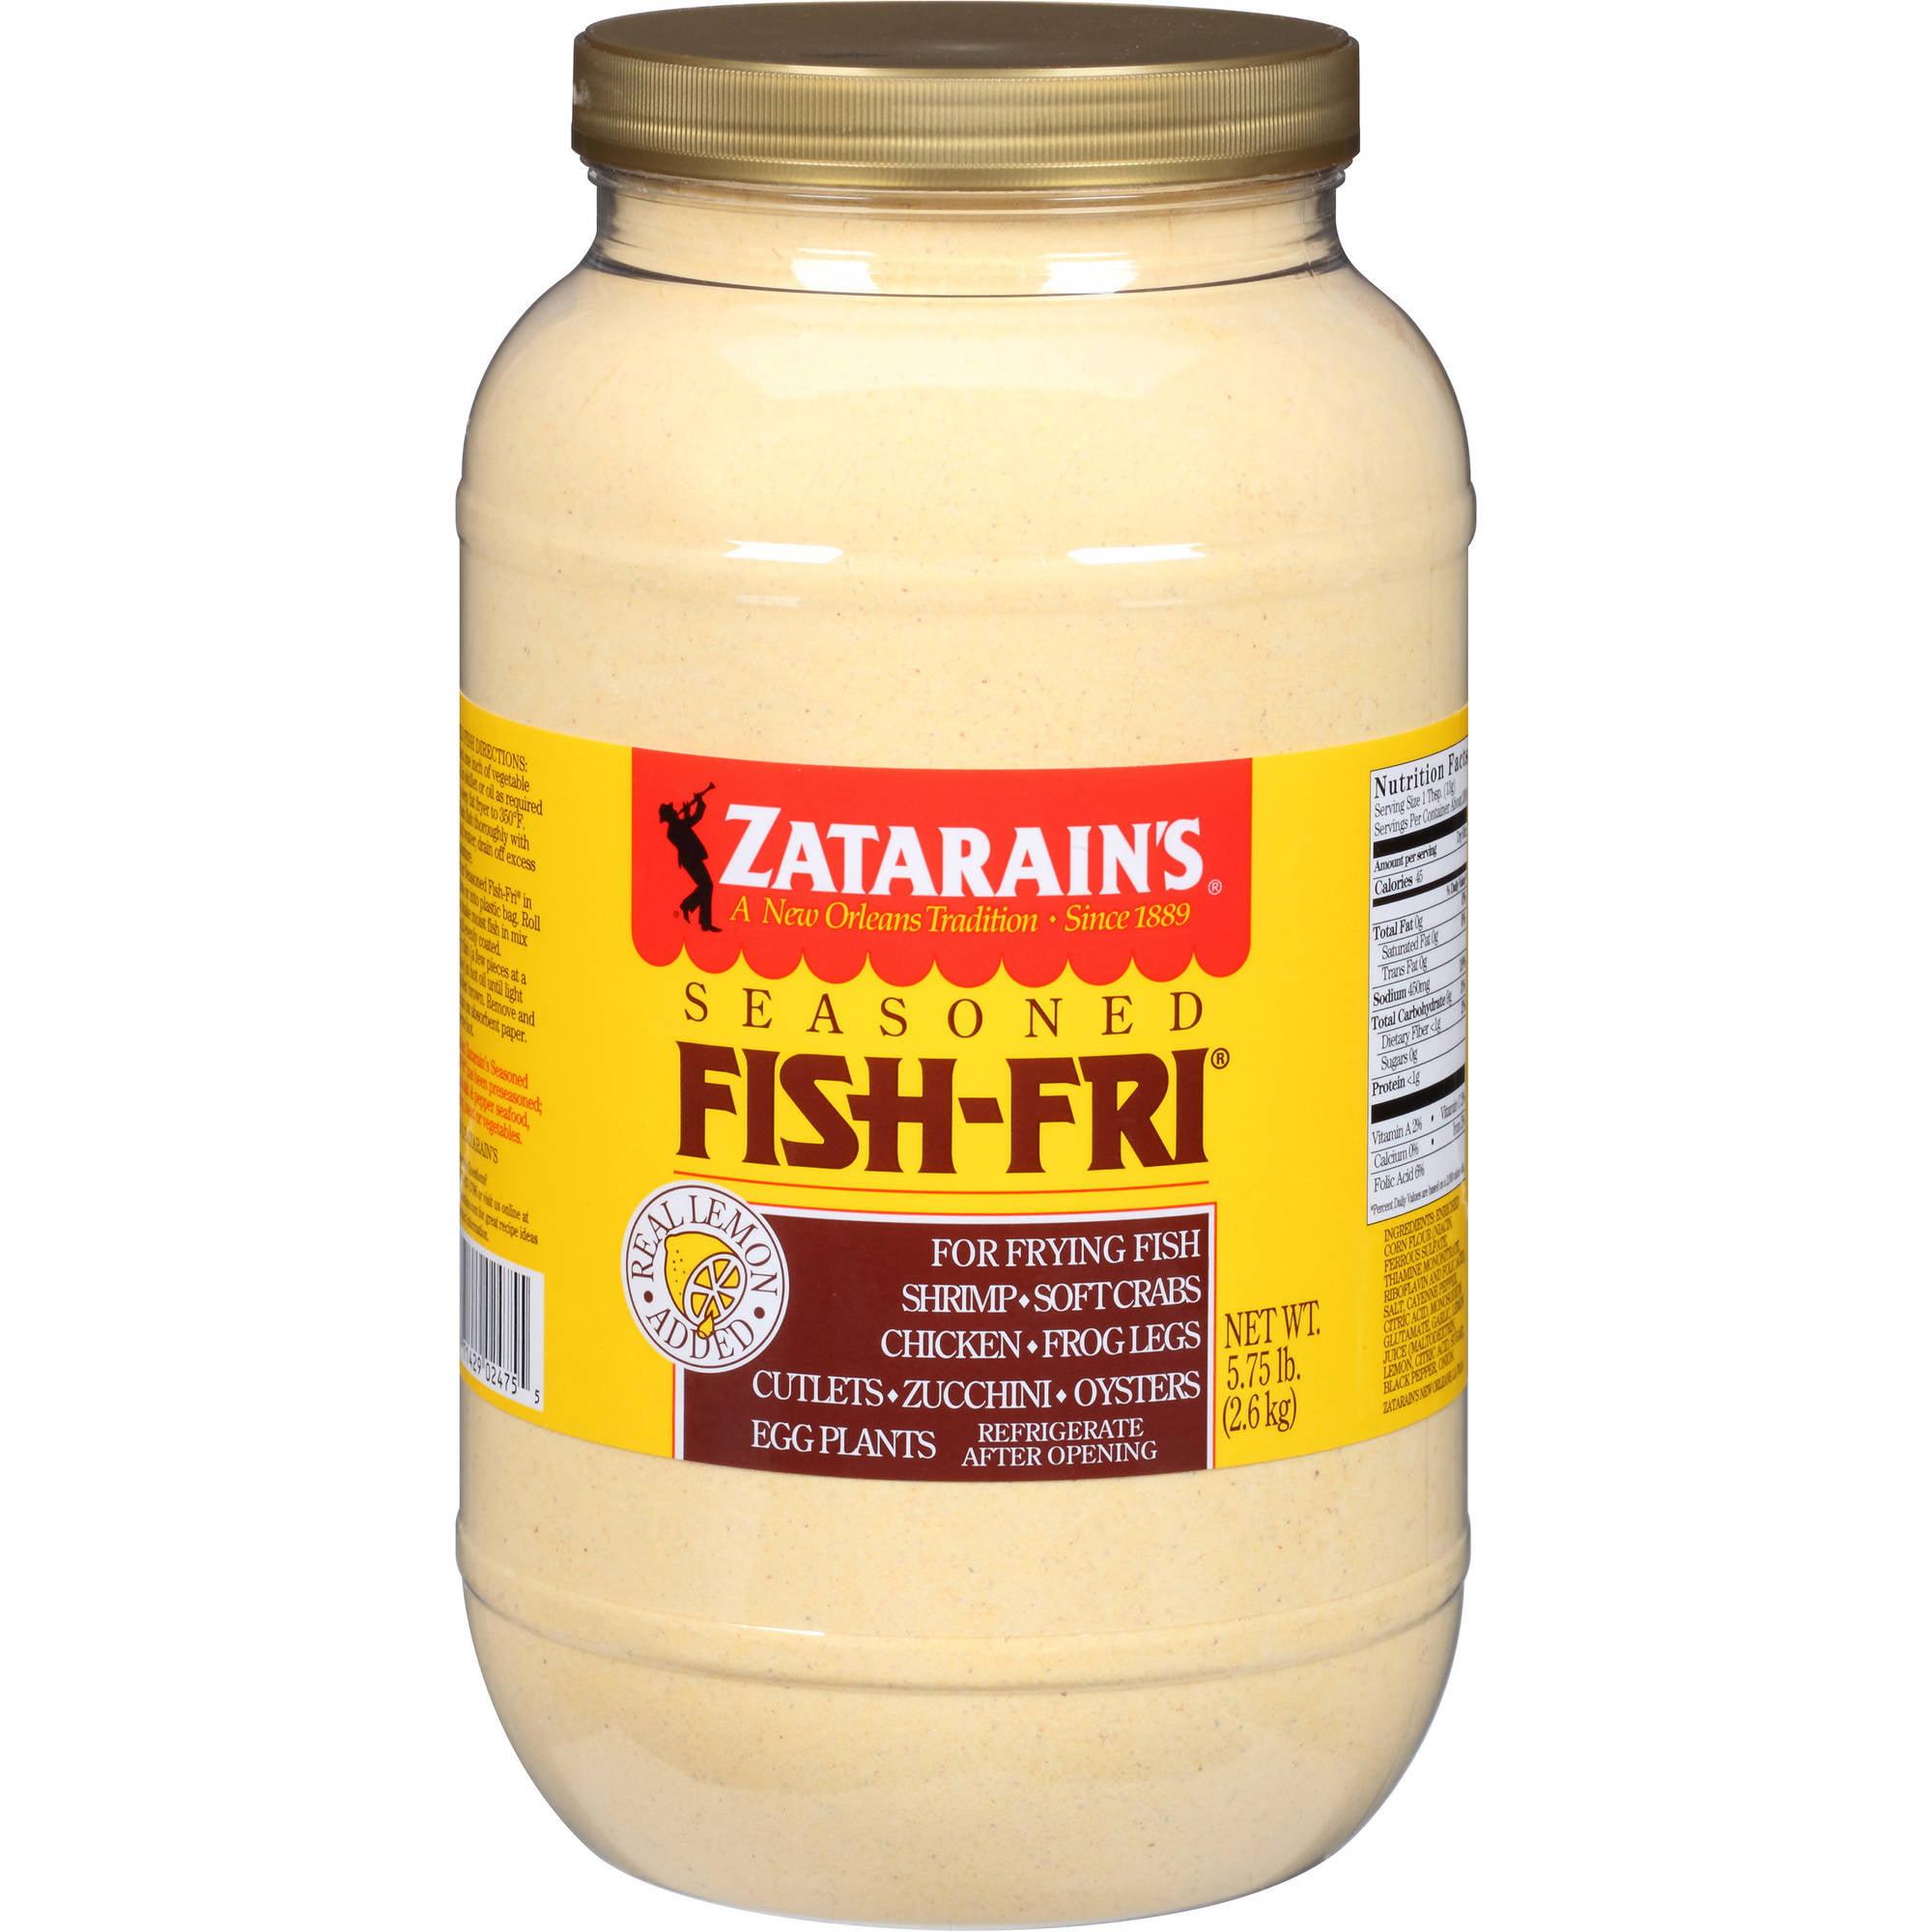 Zatarain's Seasoned Fish-Fri Mix, 5.75 lbs